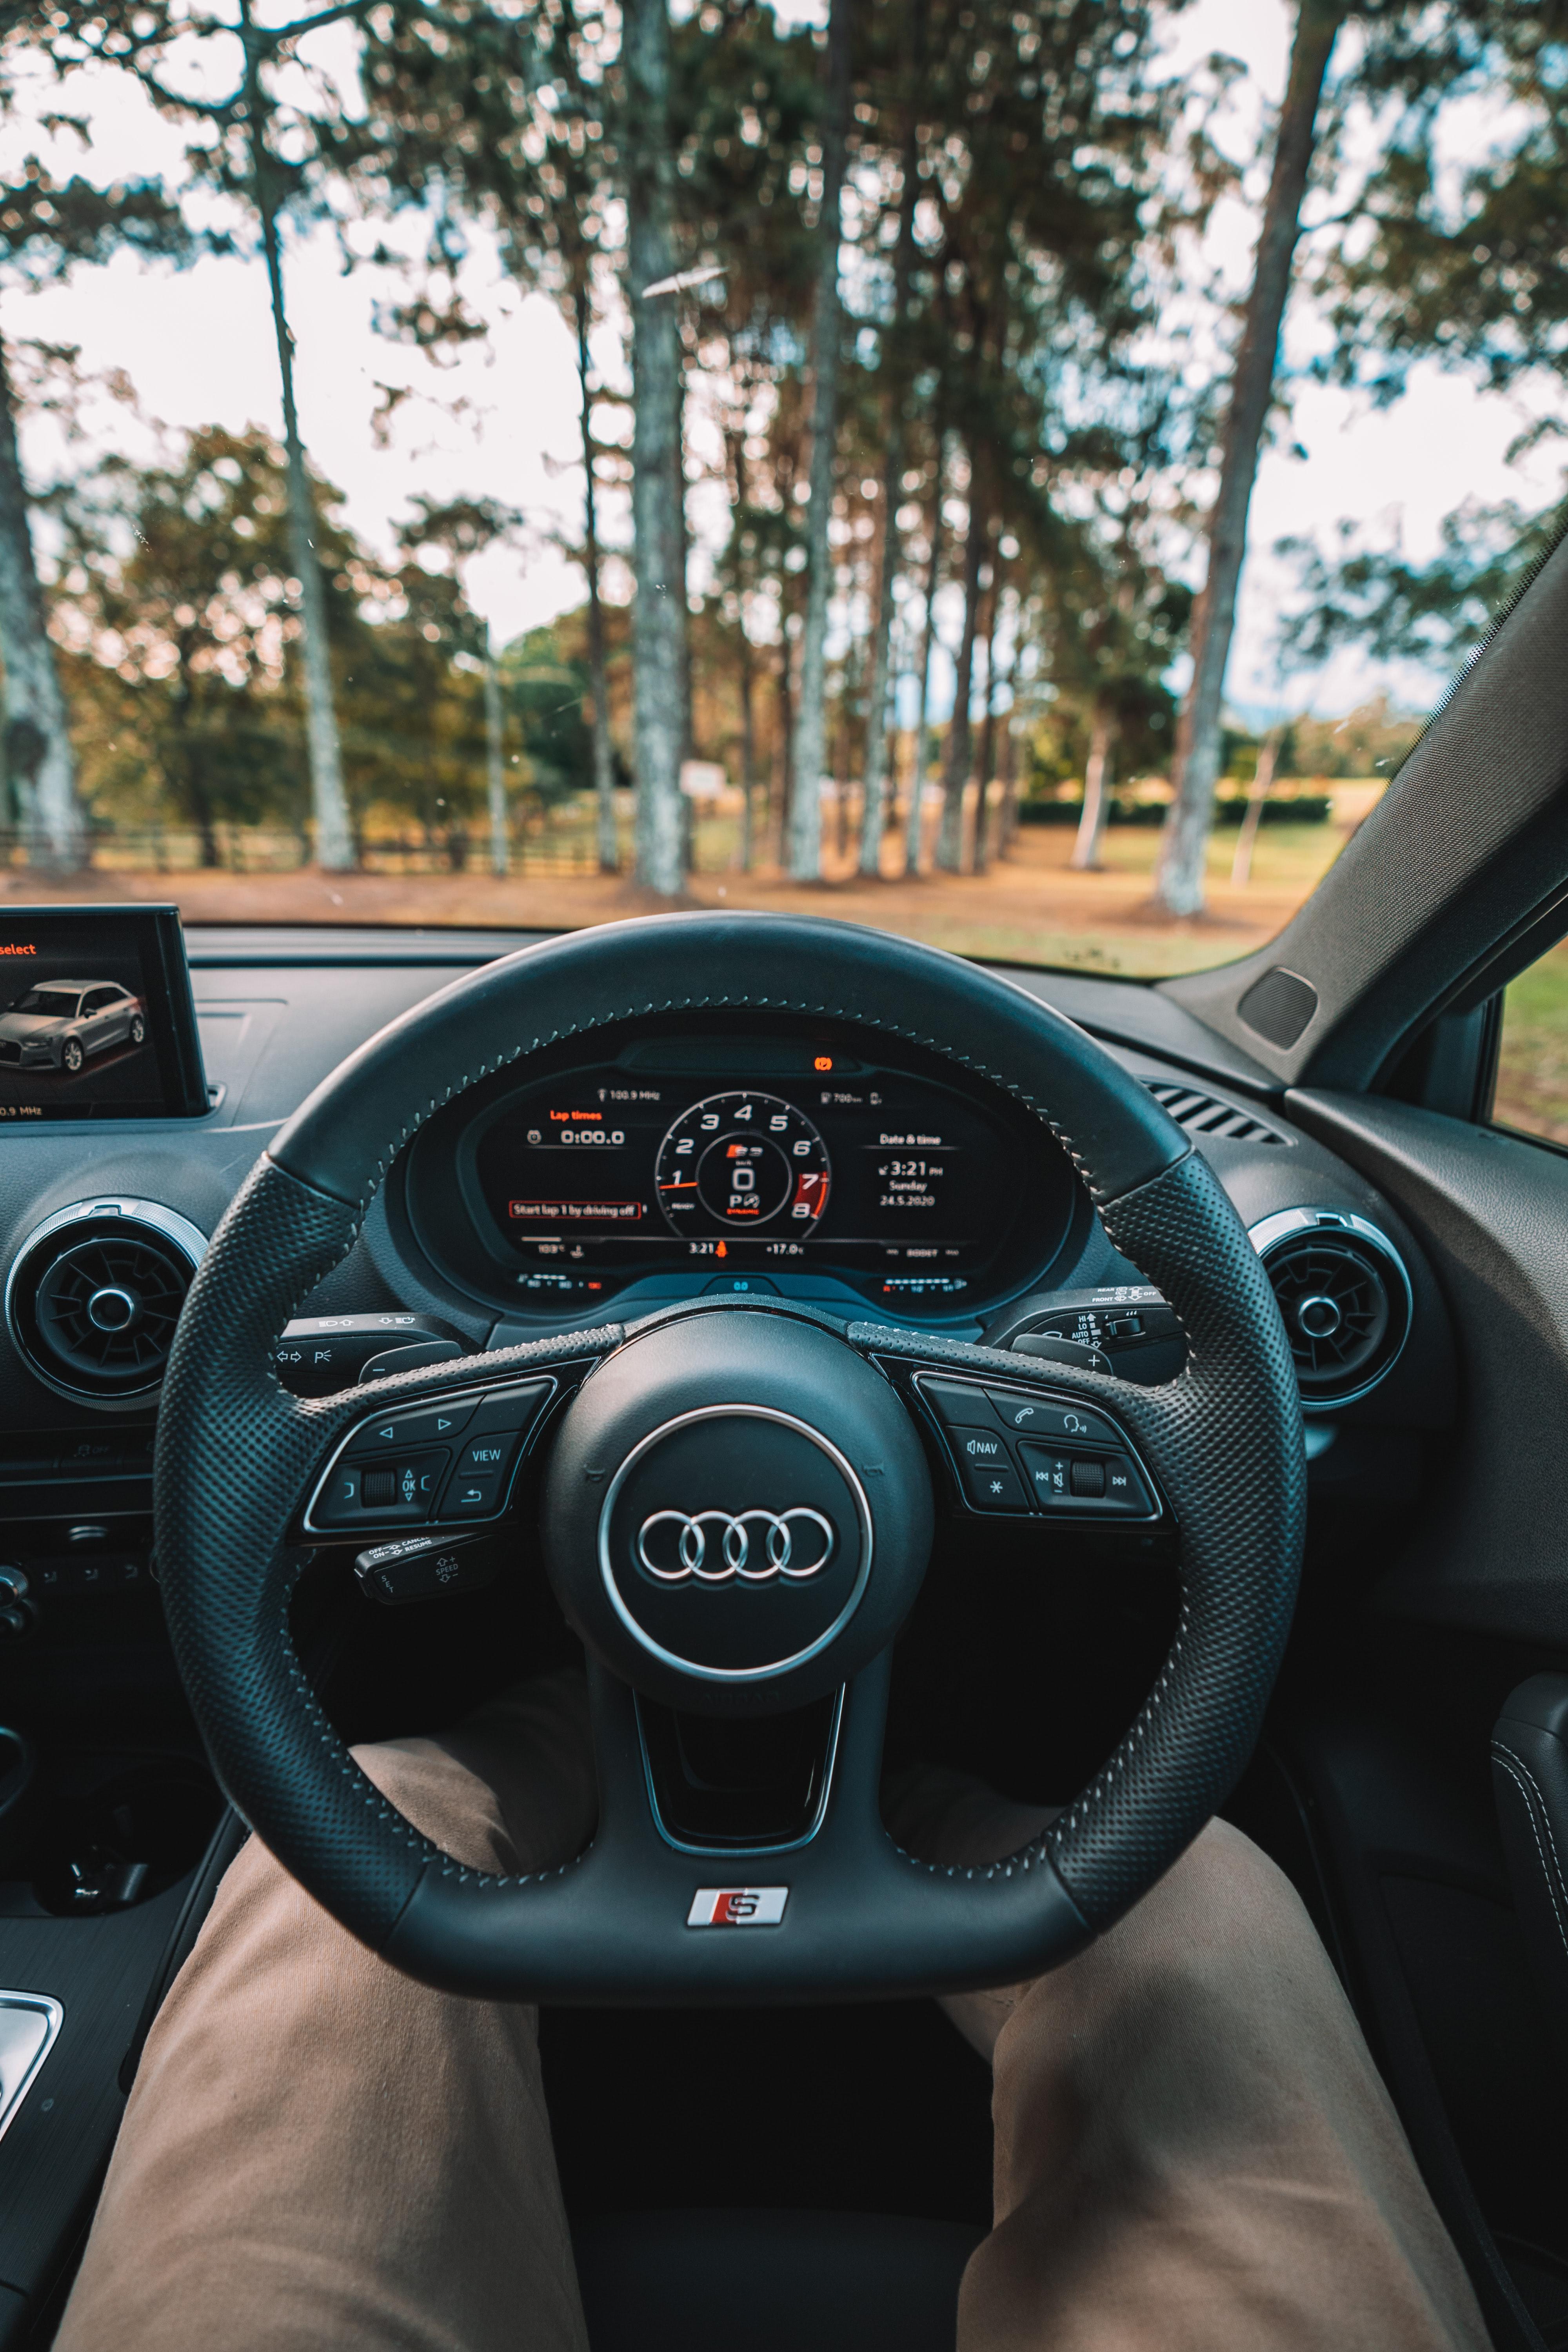 111094 Заставки и Обои Ауди (Audi) на телефон. Скачать Ауди (Audi), Тачки (Cars), Ноги, Руль, Салон, Спидометр картинки бесплатно